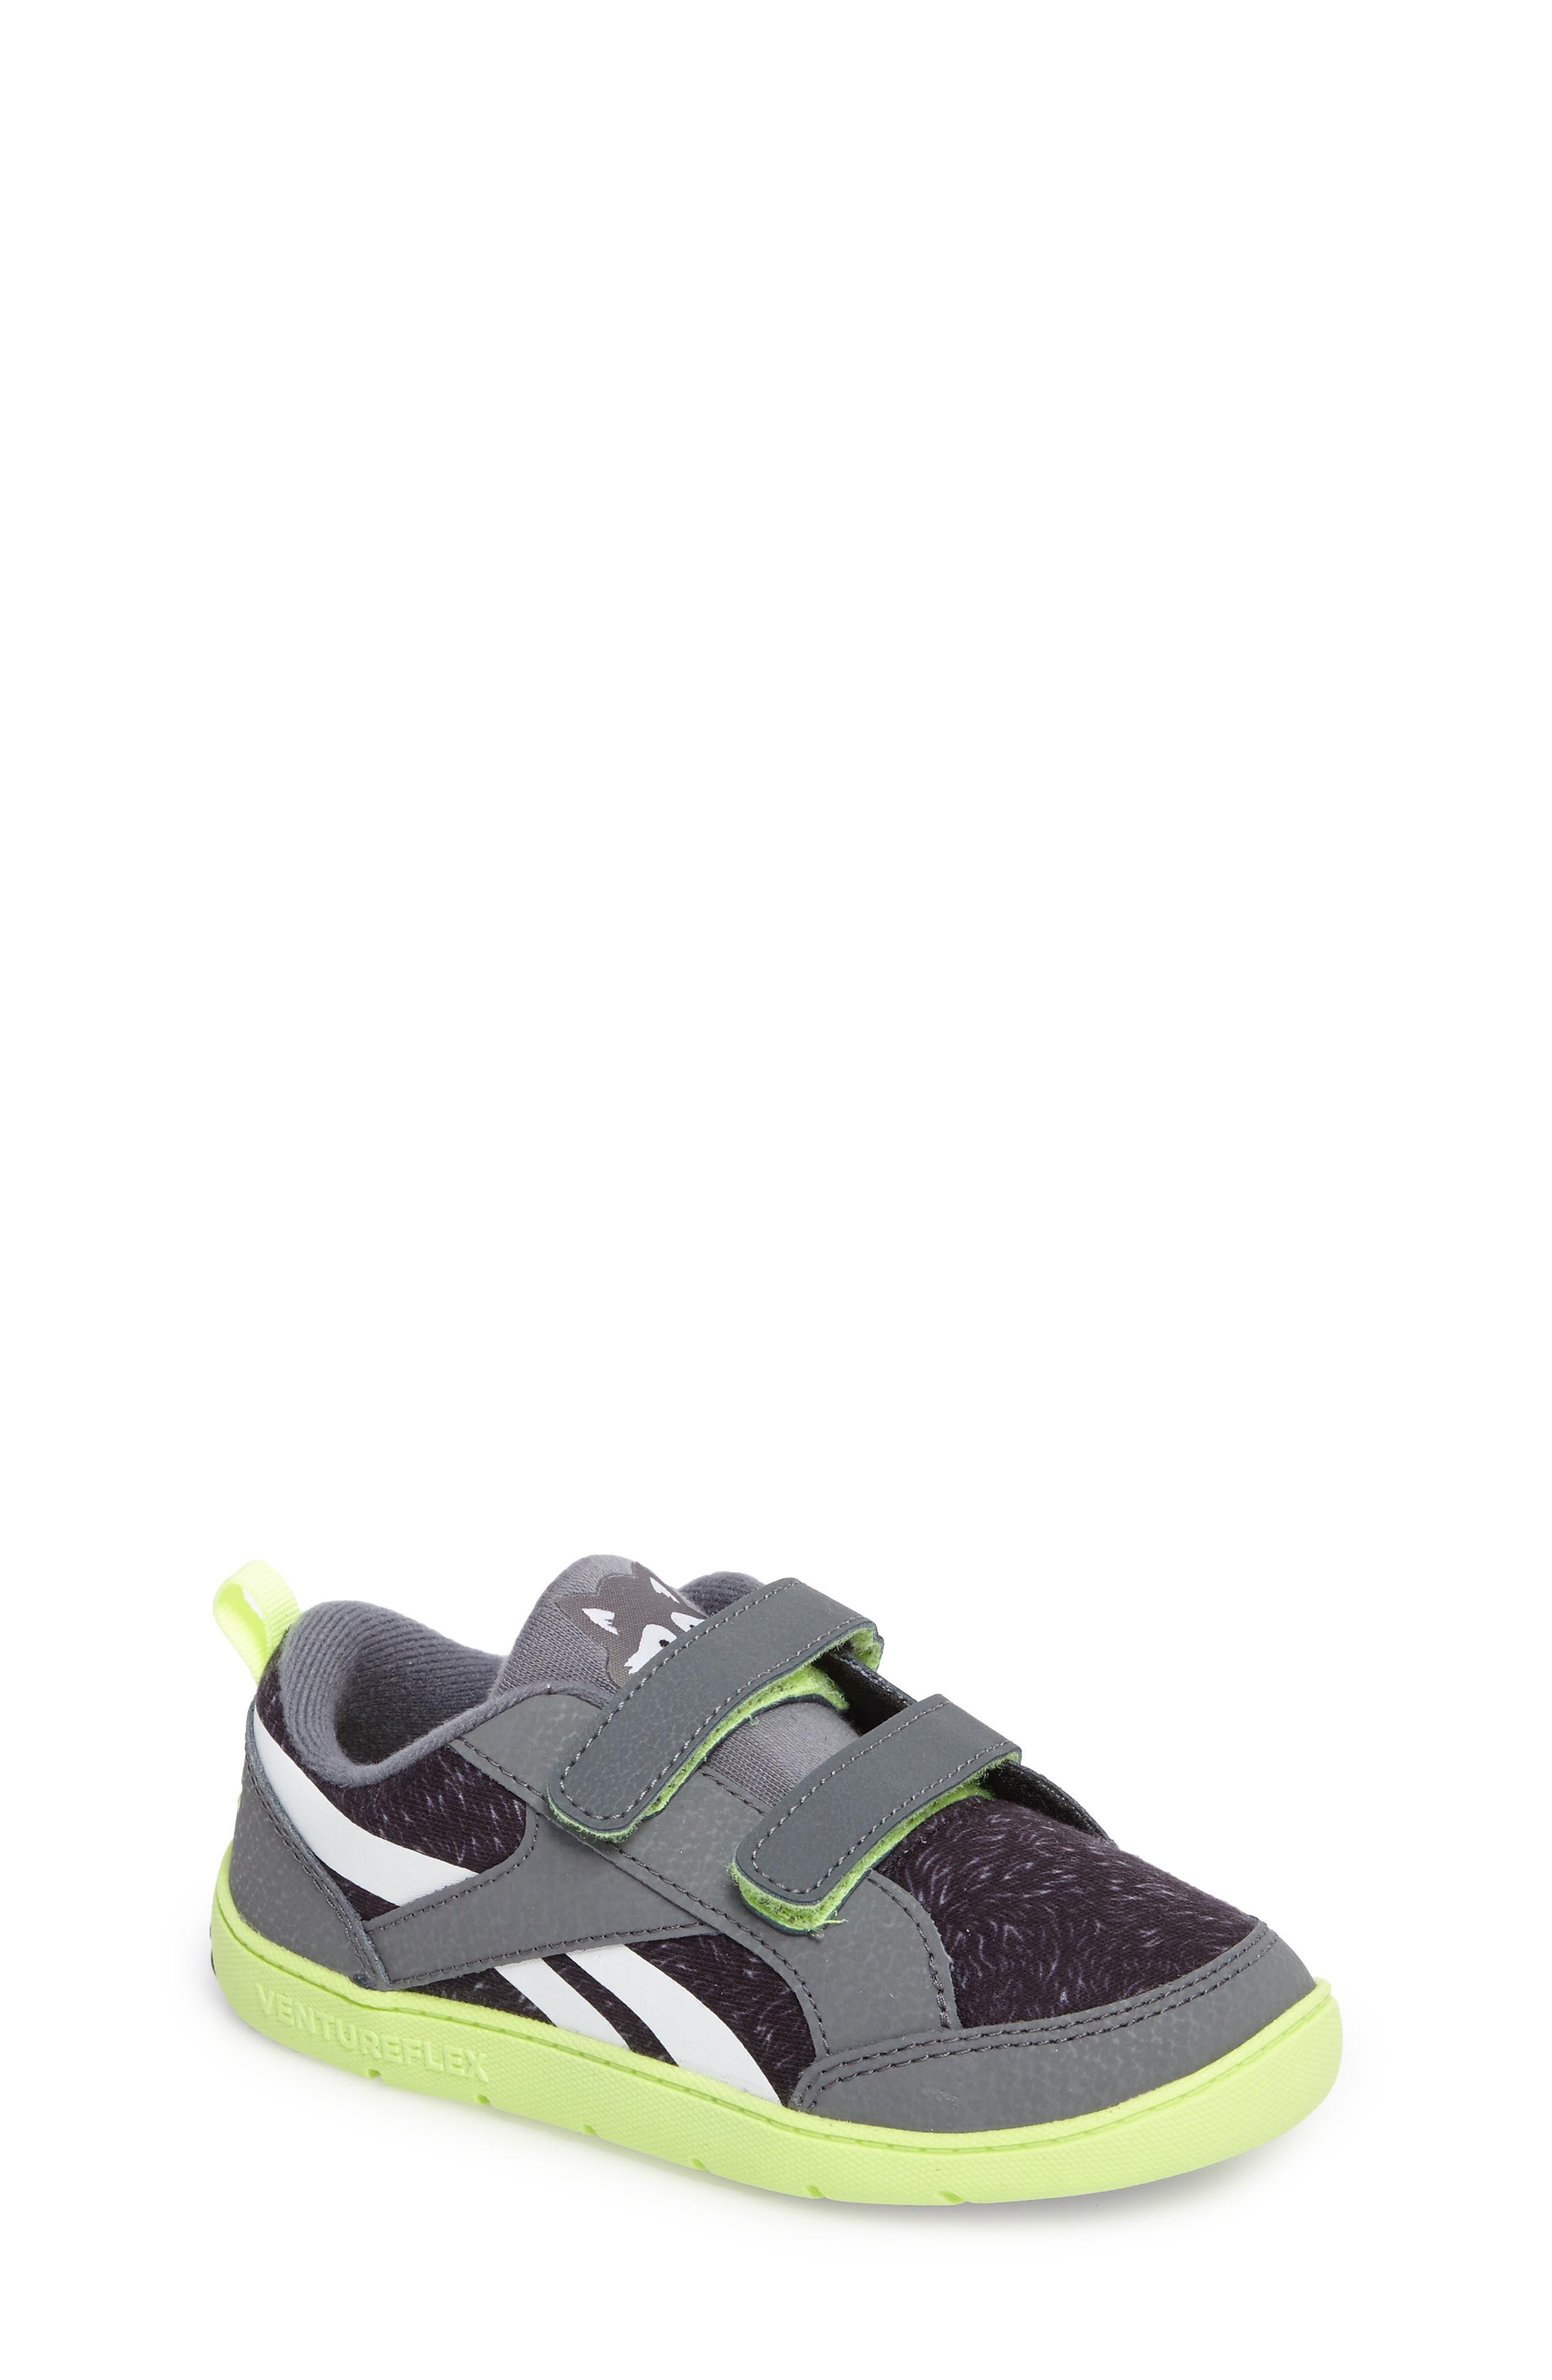 Alternate Image 1 Selected - Reebok Ventureflex Critter Feet Sneaker (Baby, Walker & Toddler)